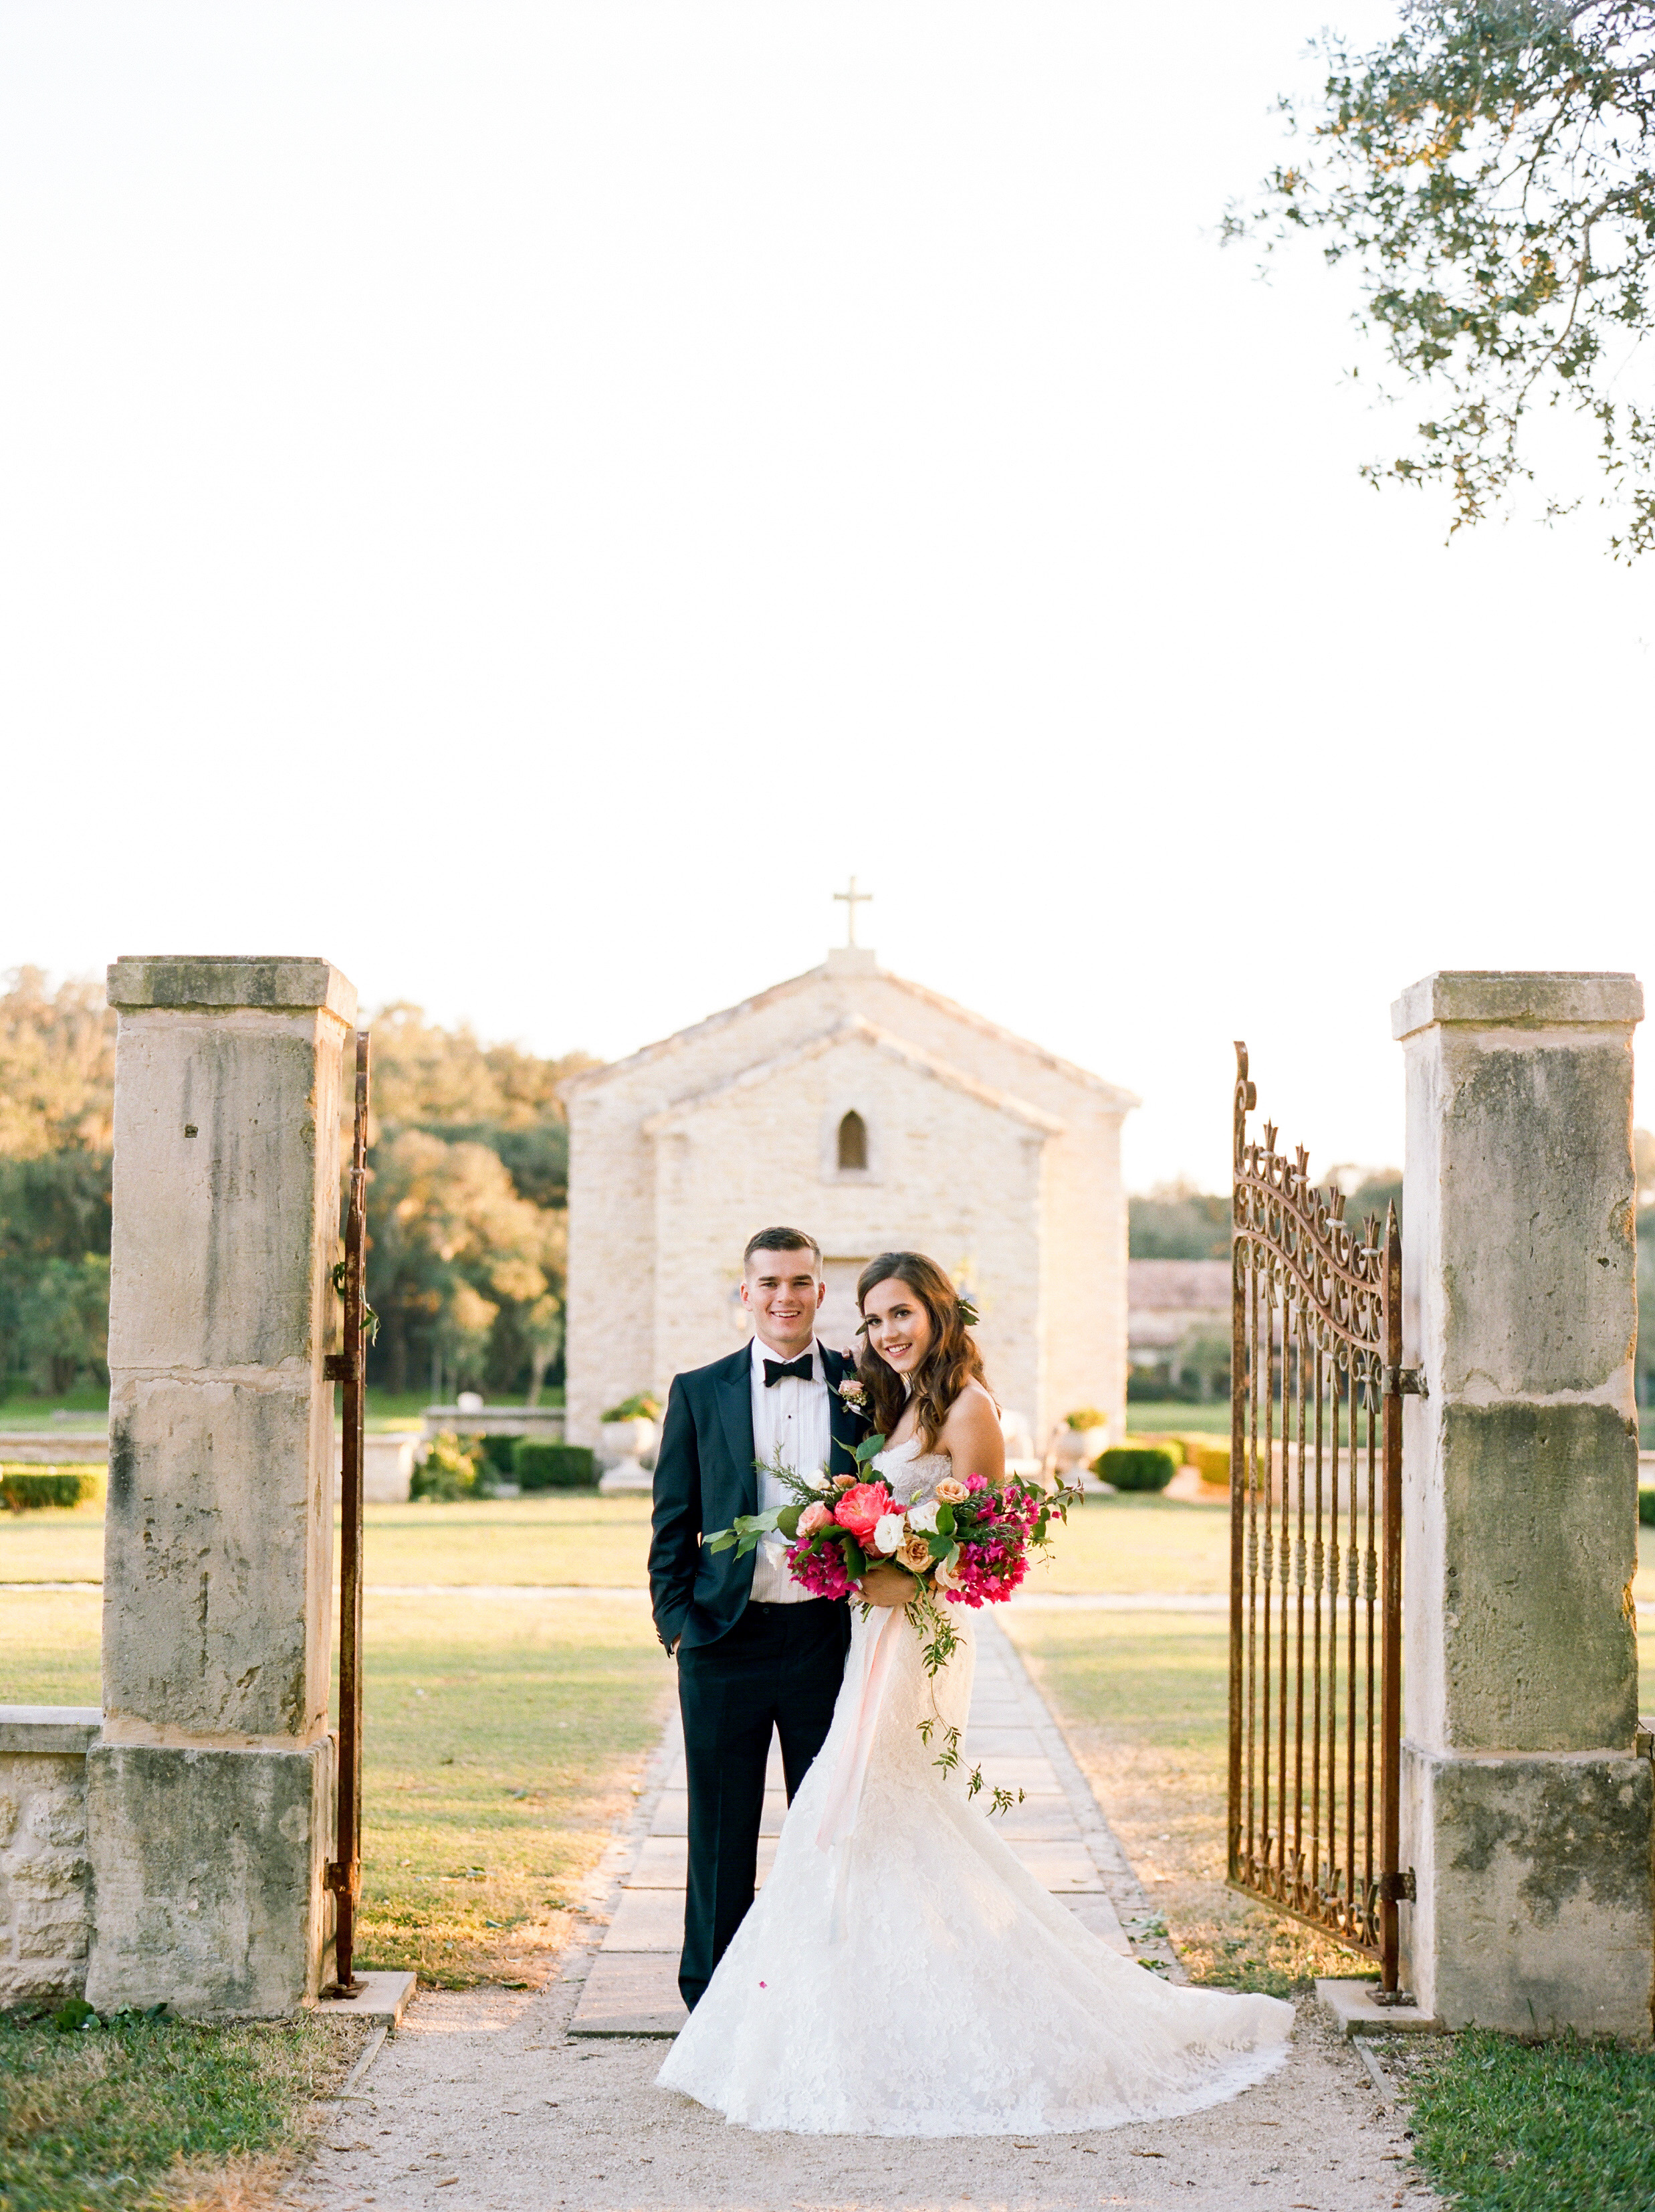 Top-Houston-Wedding-Photographer-Dana-Fernandez-Photography-The-Clubs-At-Houston-Oaks-Country-Club-Belle-Events-Film-Fine-Art-Destination-12.jpg